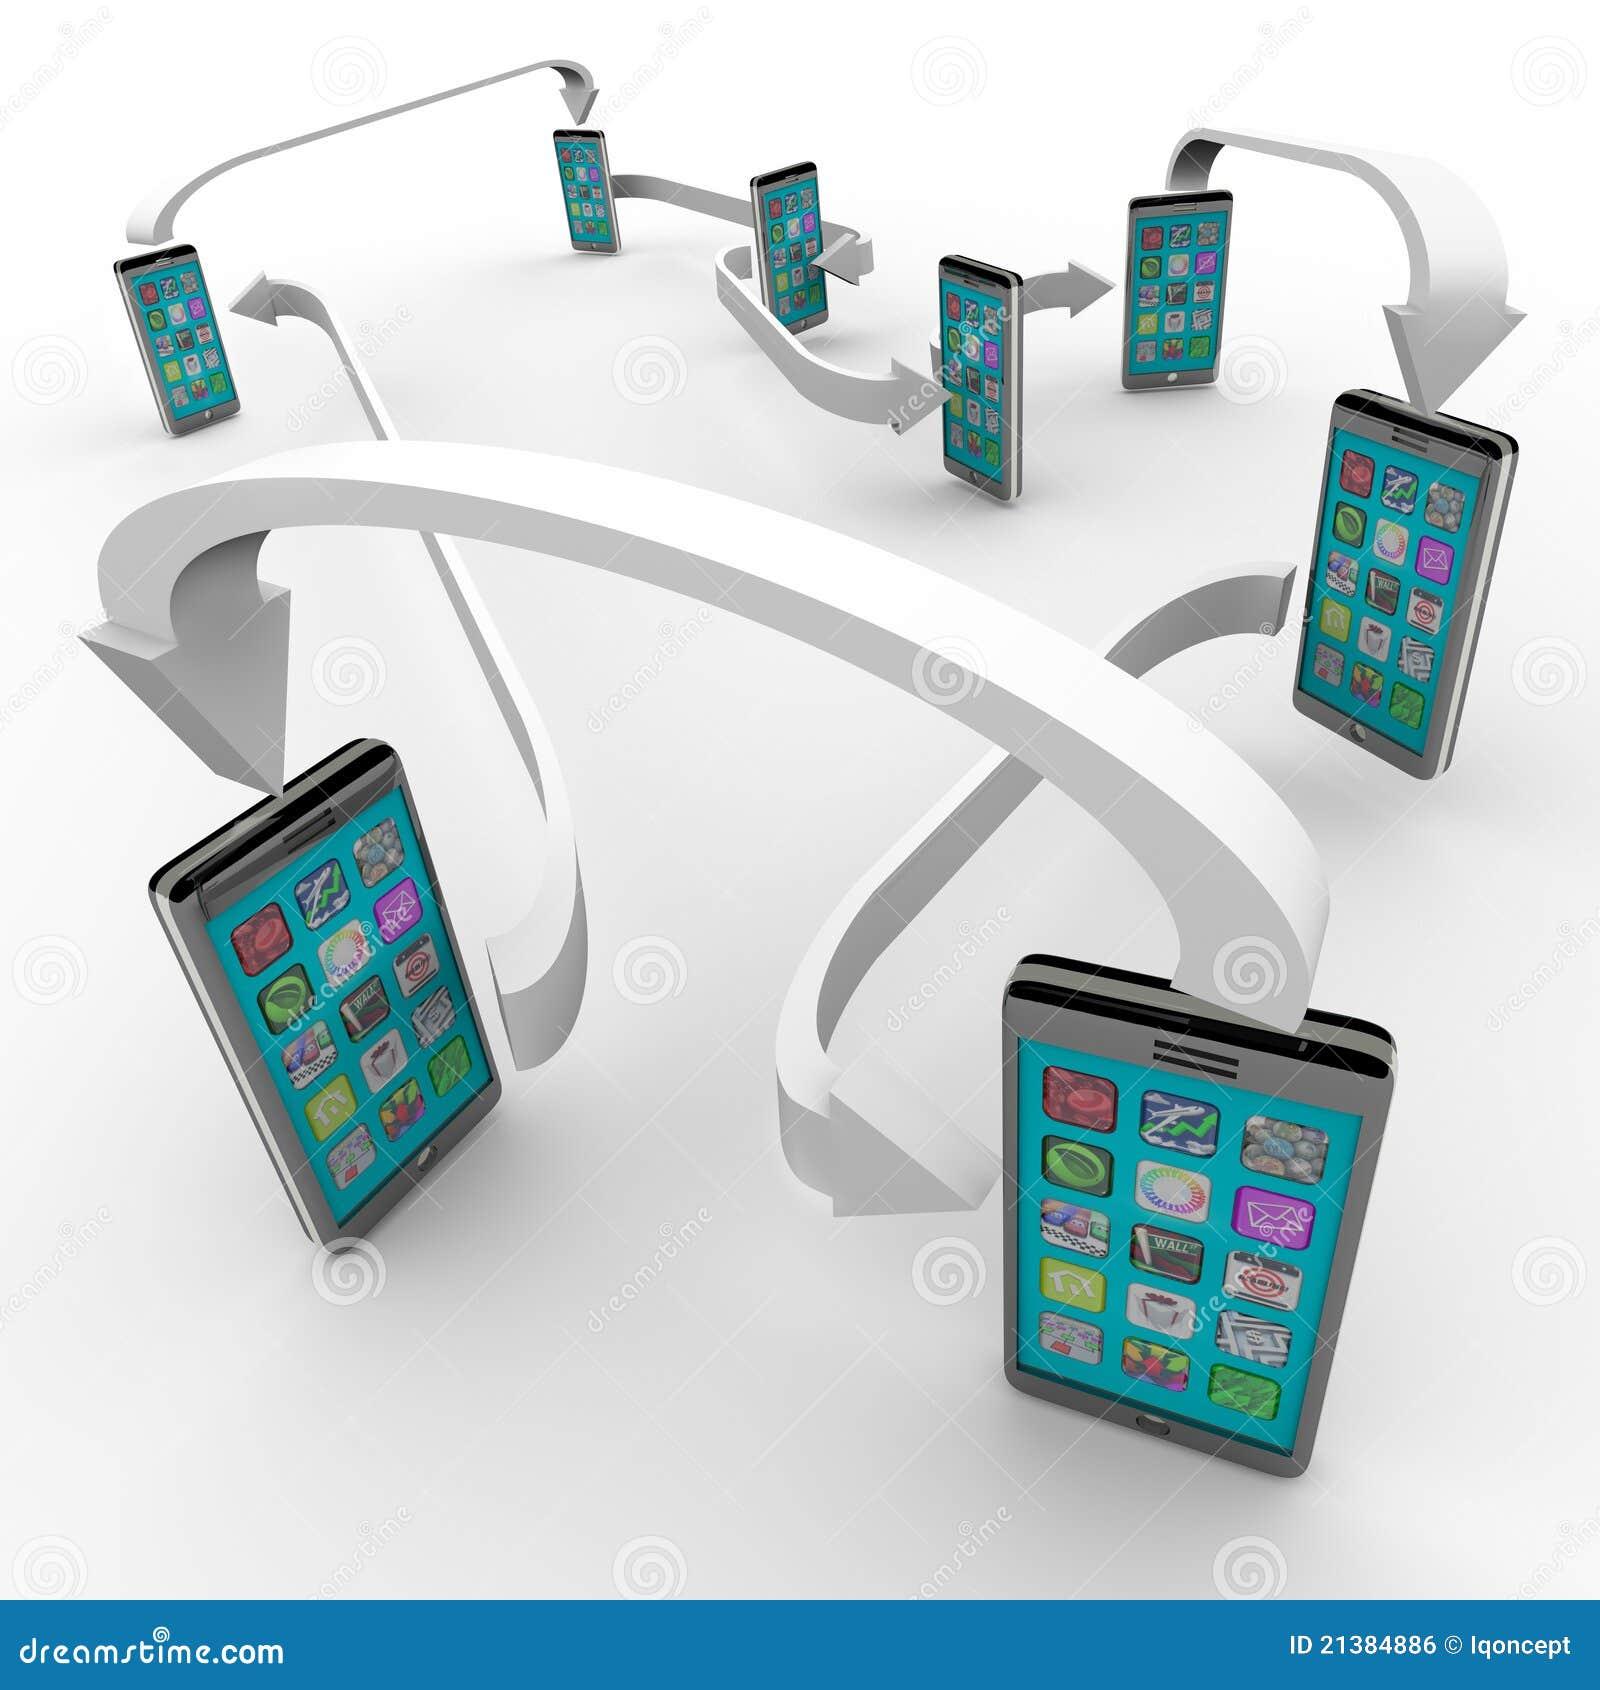 Verbundene intelligente Telefon-Handy-Kommunikation